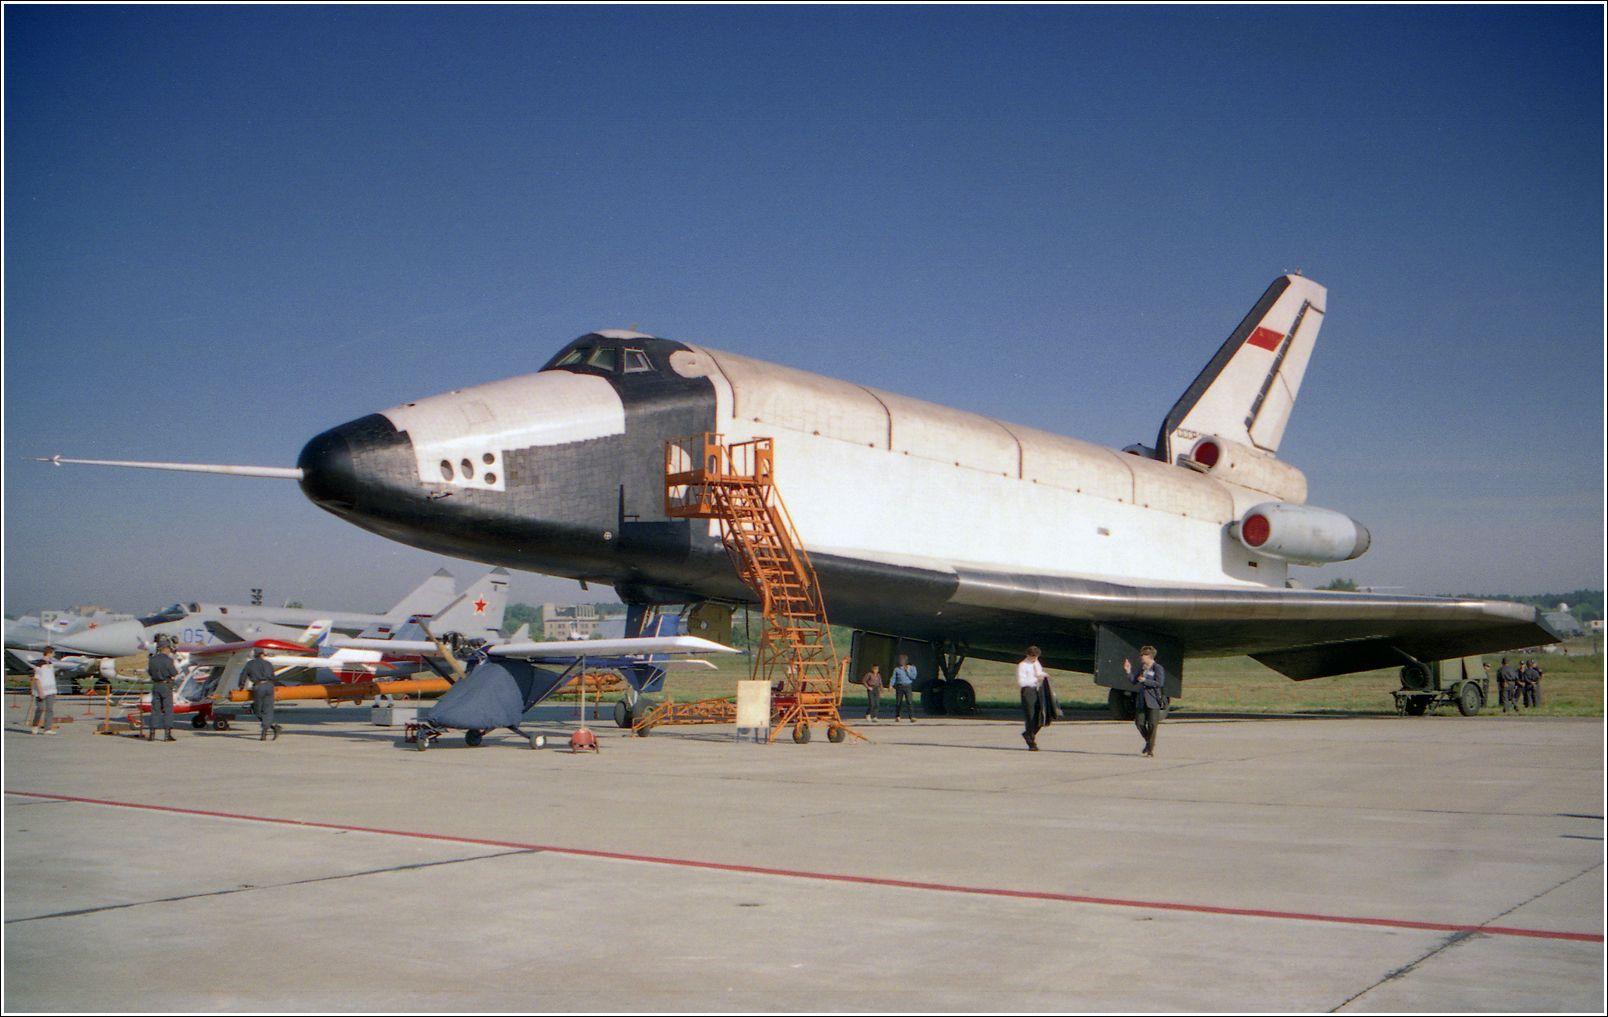 Буран, 1998 год Буран авиация космонавтика челнок стоянка Жуковский 1998